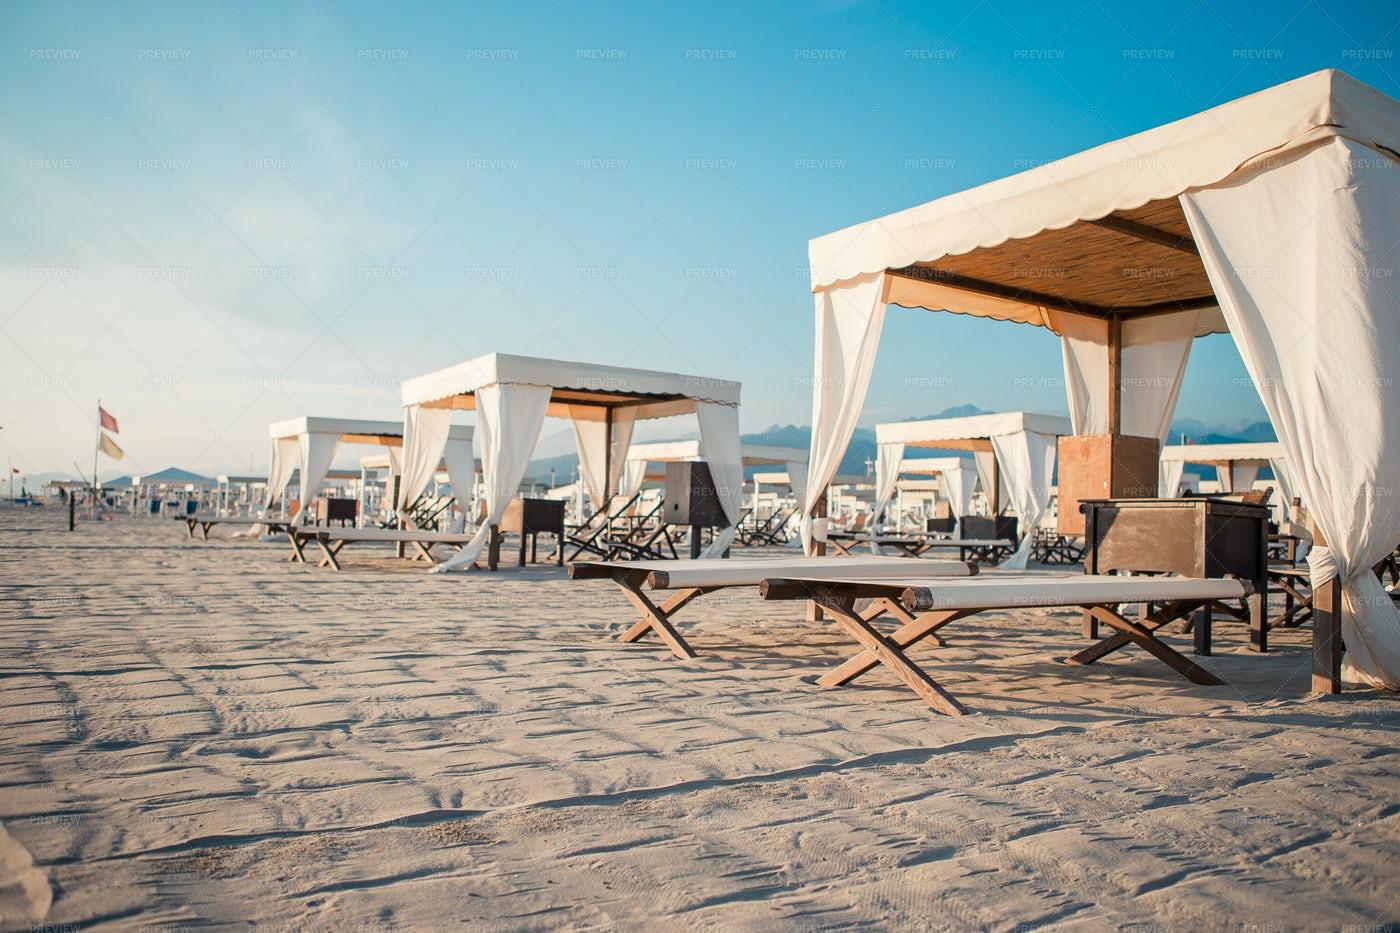 Luxury Sun Beds At The Beach: Stock Photos